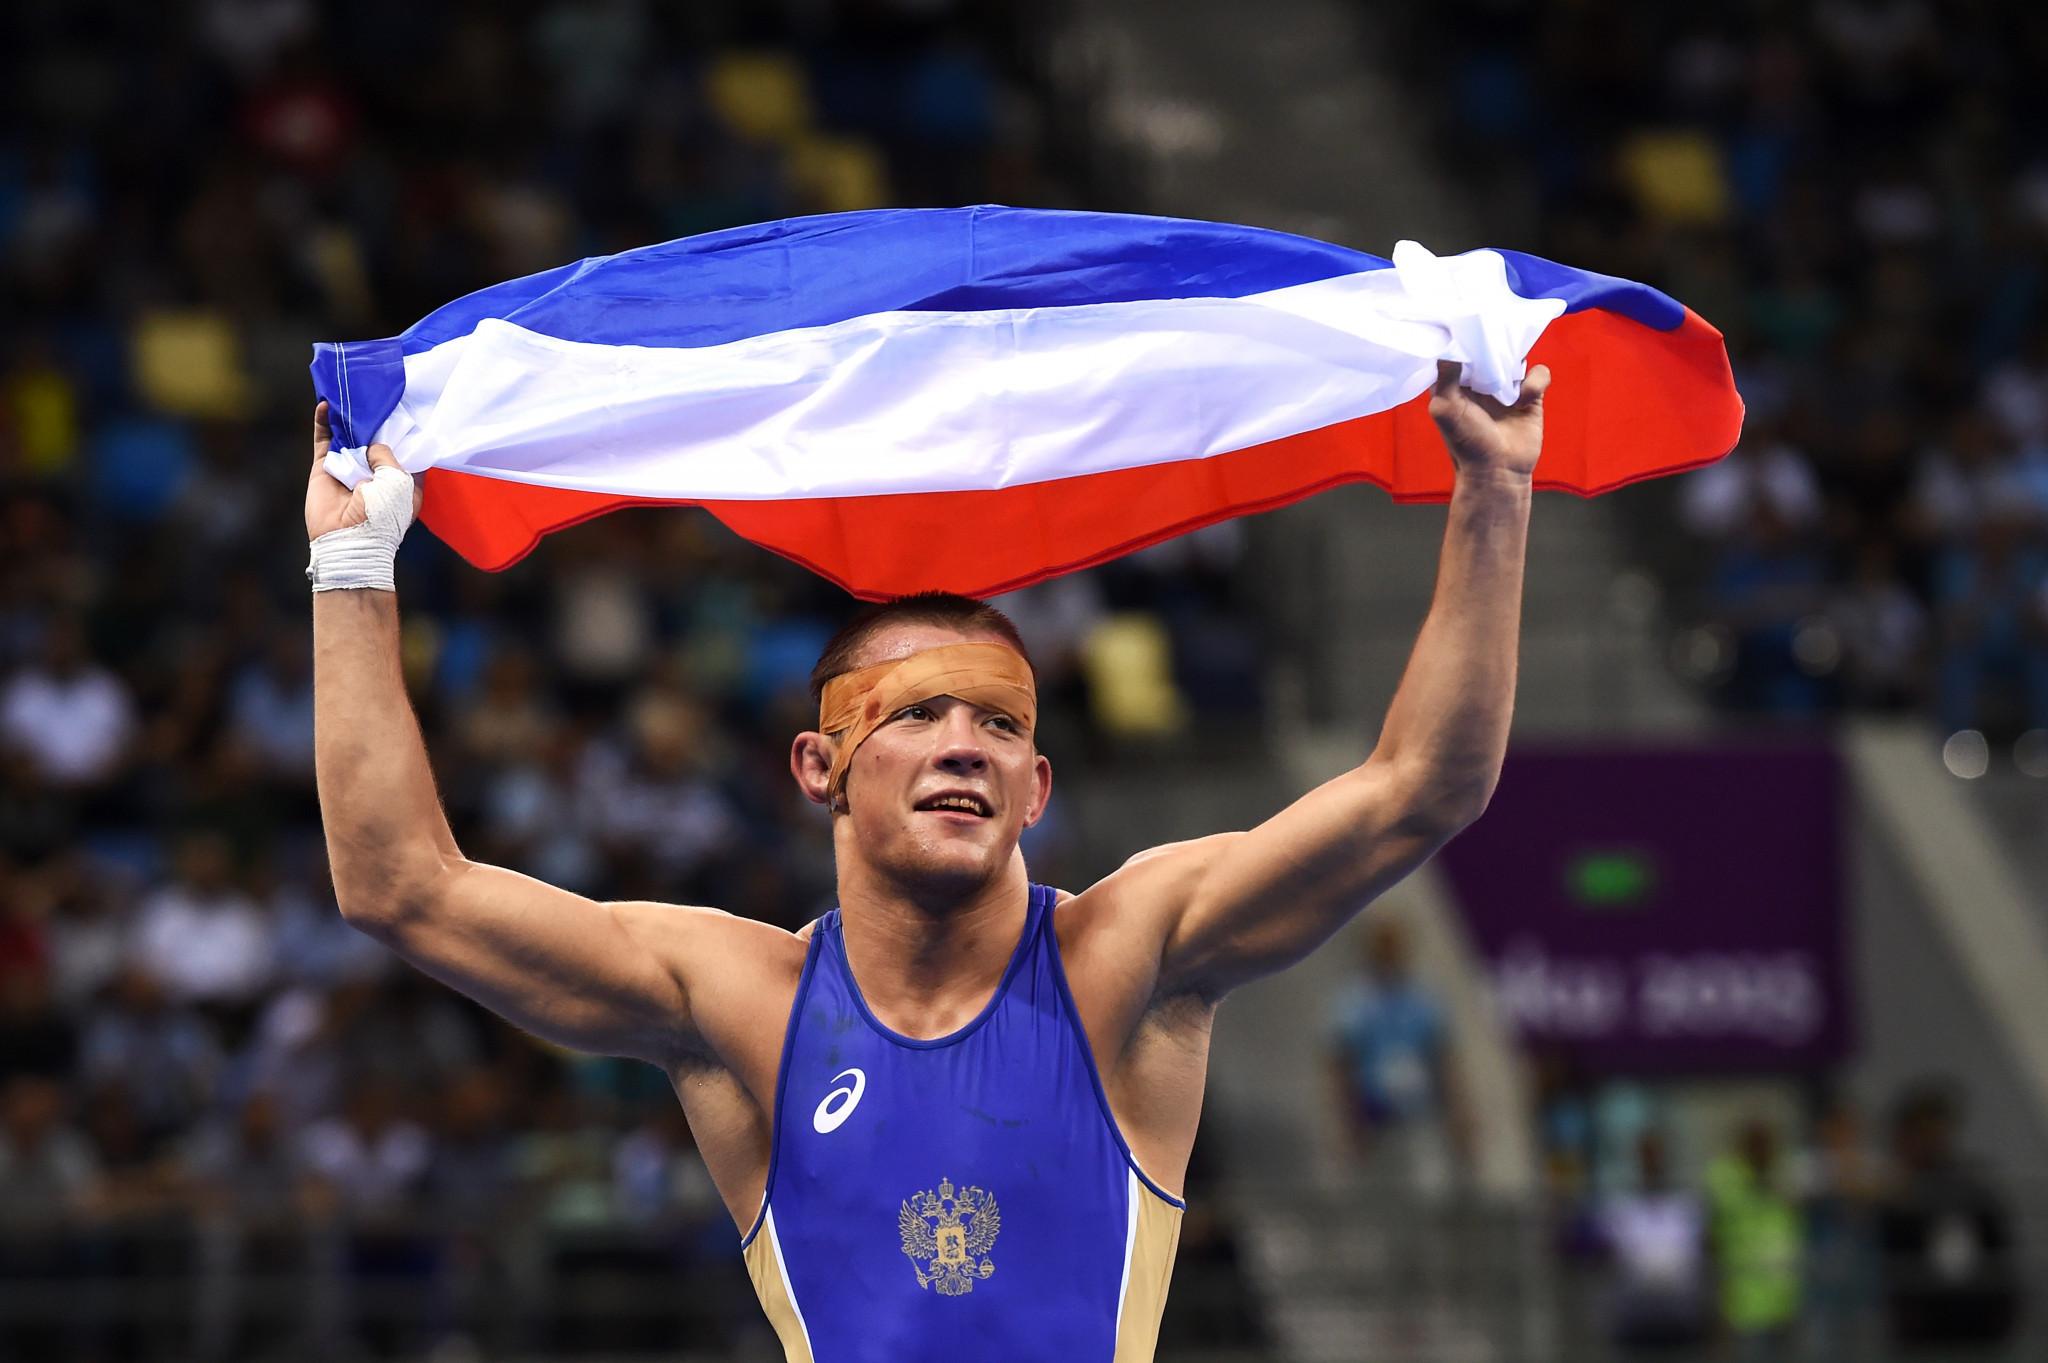 Hosts Russia dominate day three of European Wrestling Championships in Kaspiysk